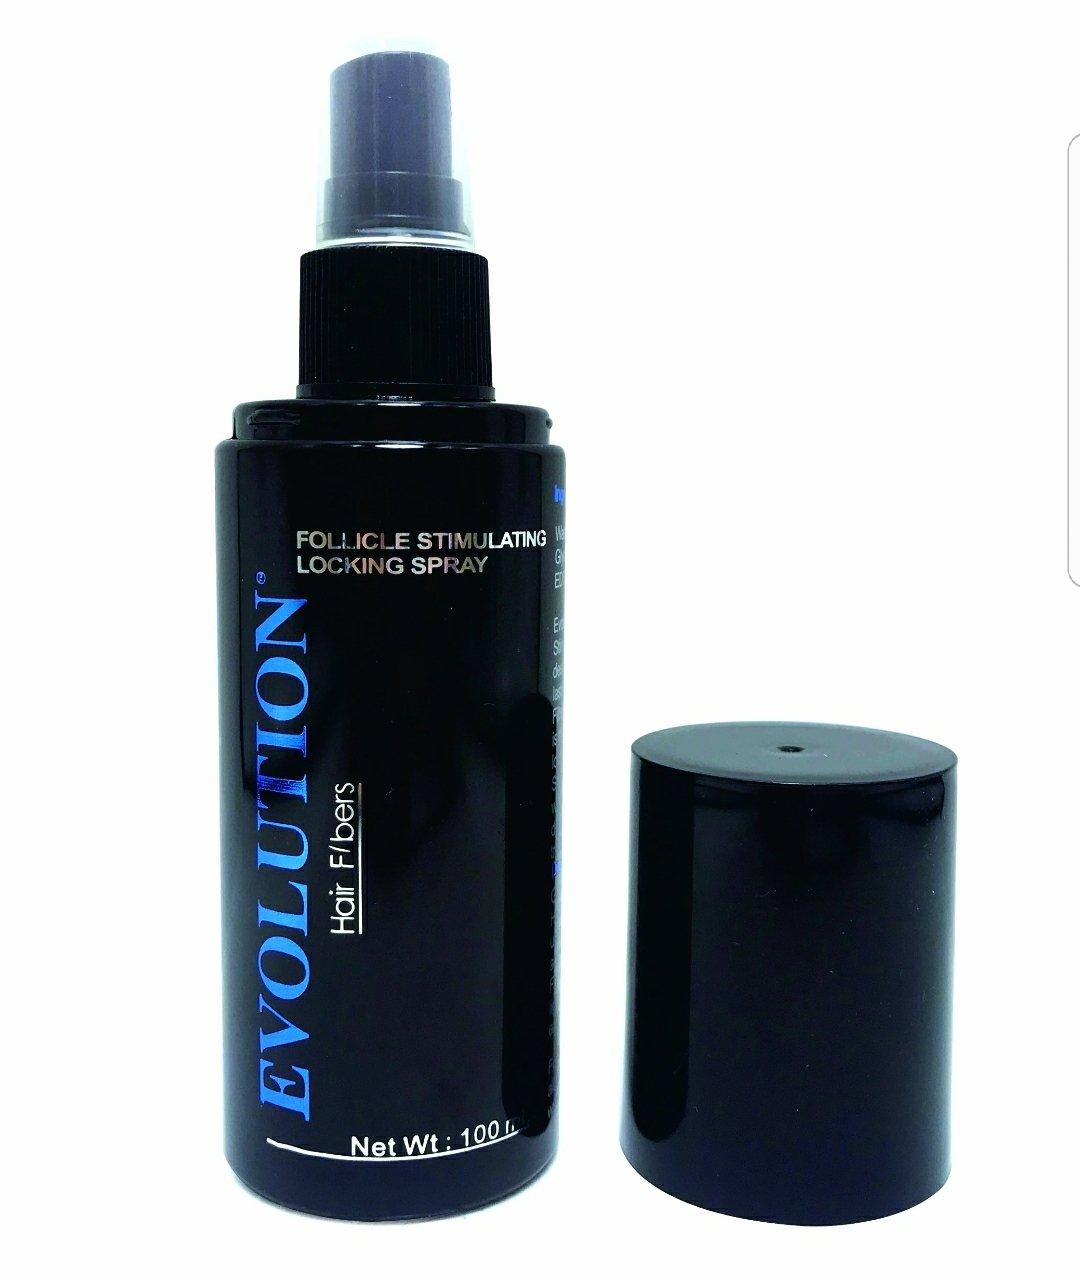 Evolution Hair Fibers Follicle Locking Stimulating Wholesale Spray Fiber Very popular!